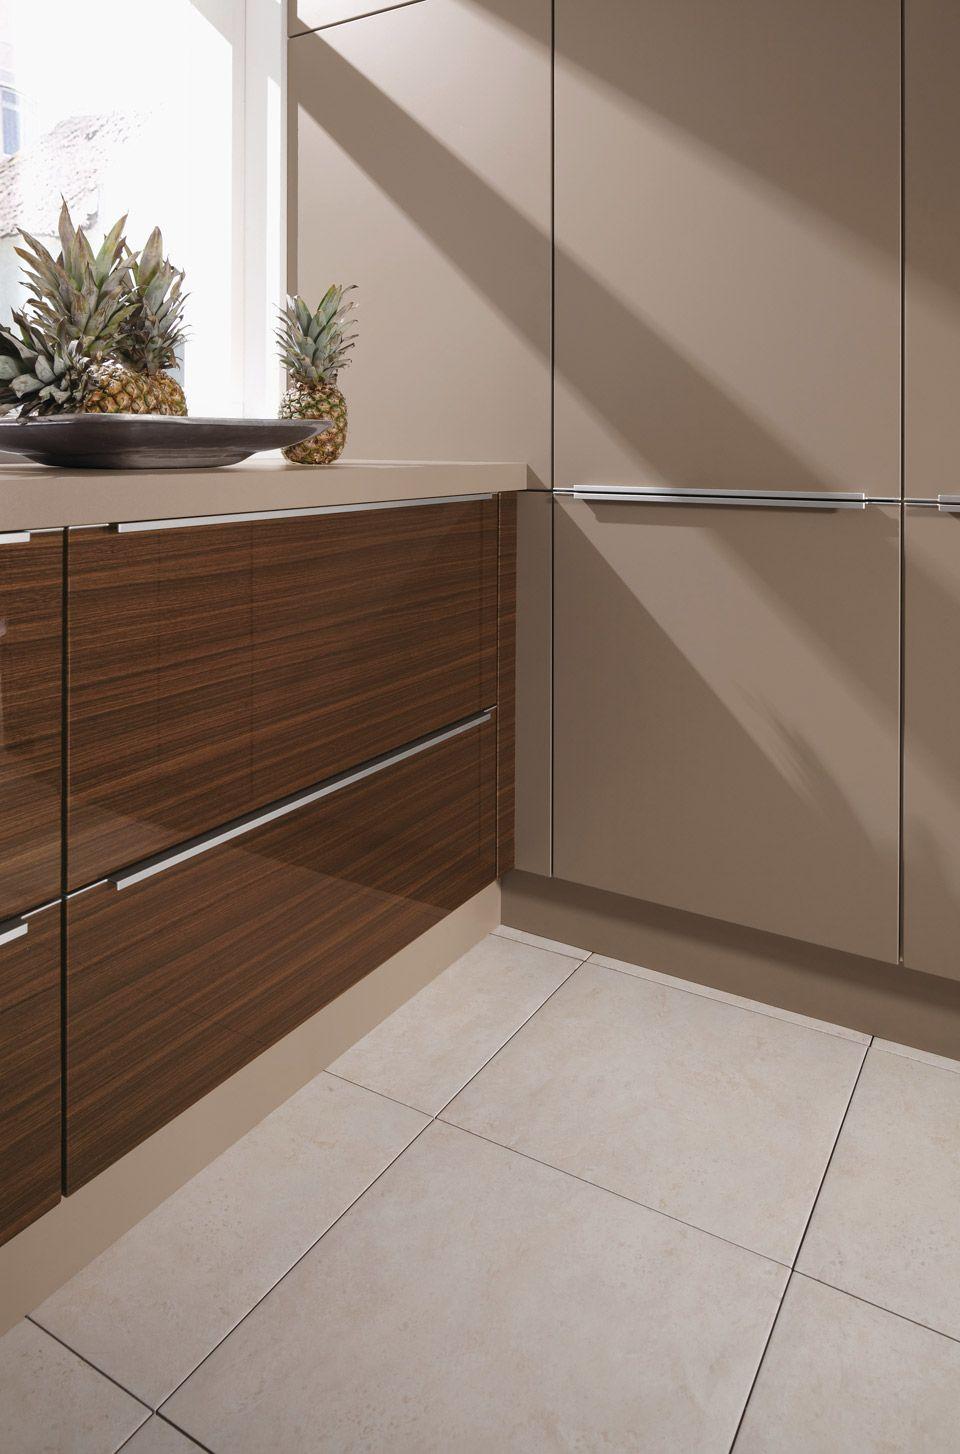 We31411010 Studio Varia Brown Wall Decor Decor Modern Kitchen Design